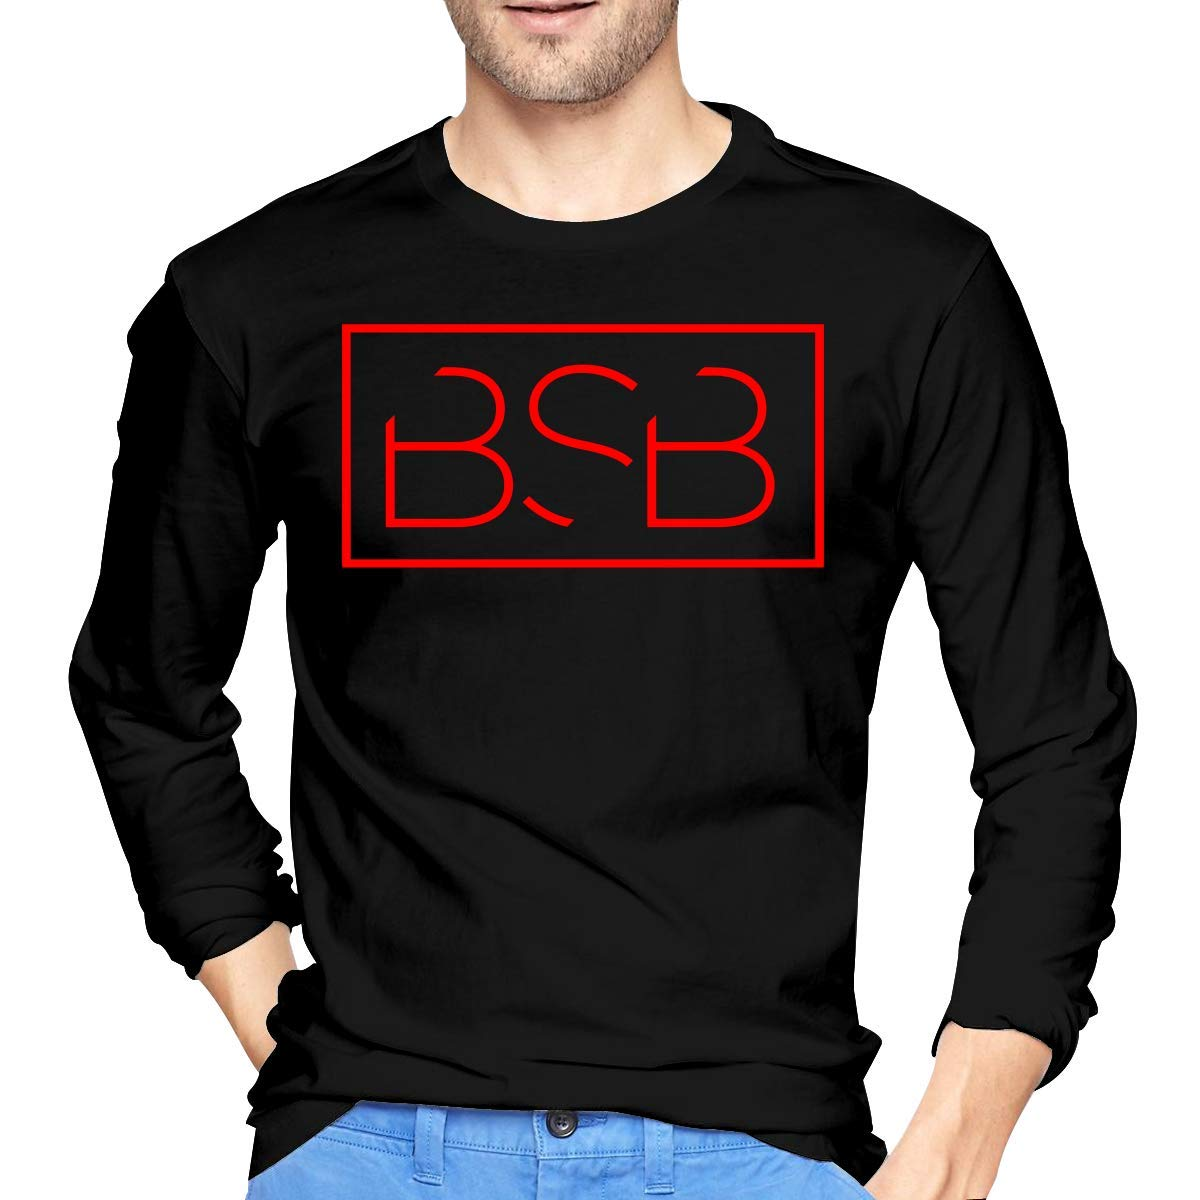 Yksth S Backstreet Tee 5831 Shirts